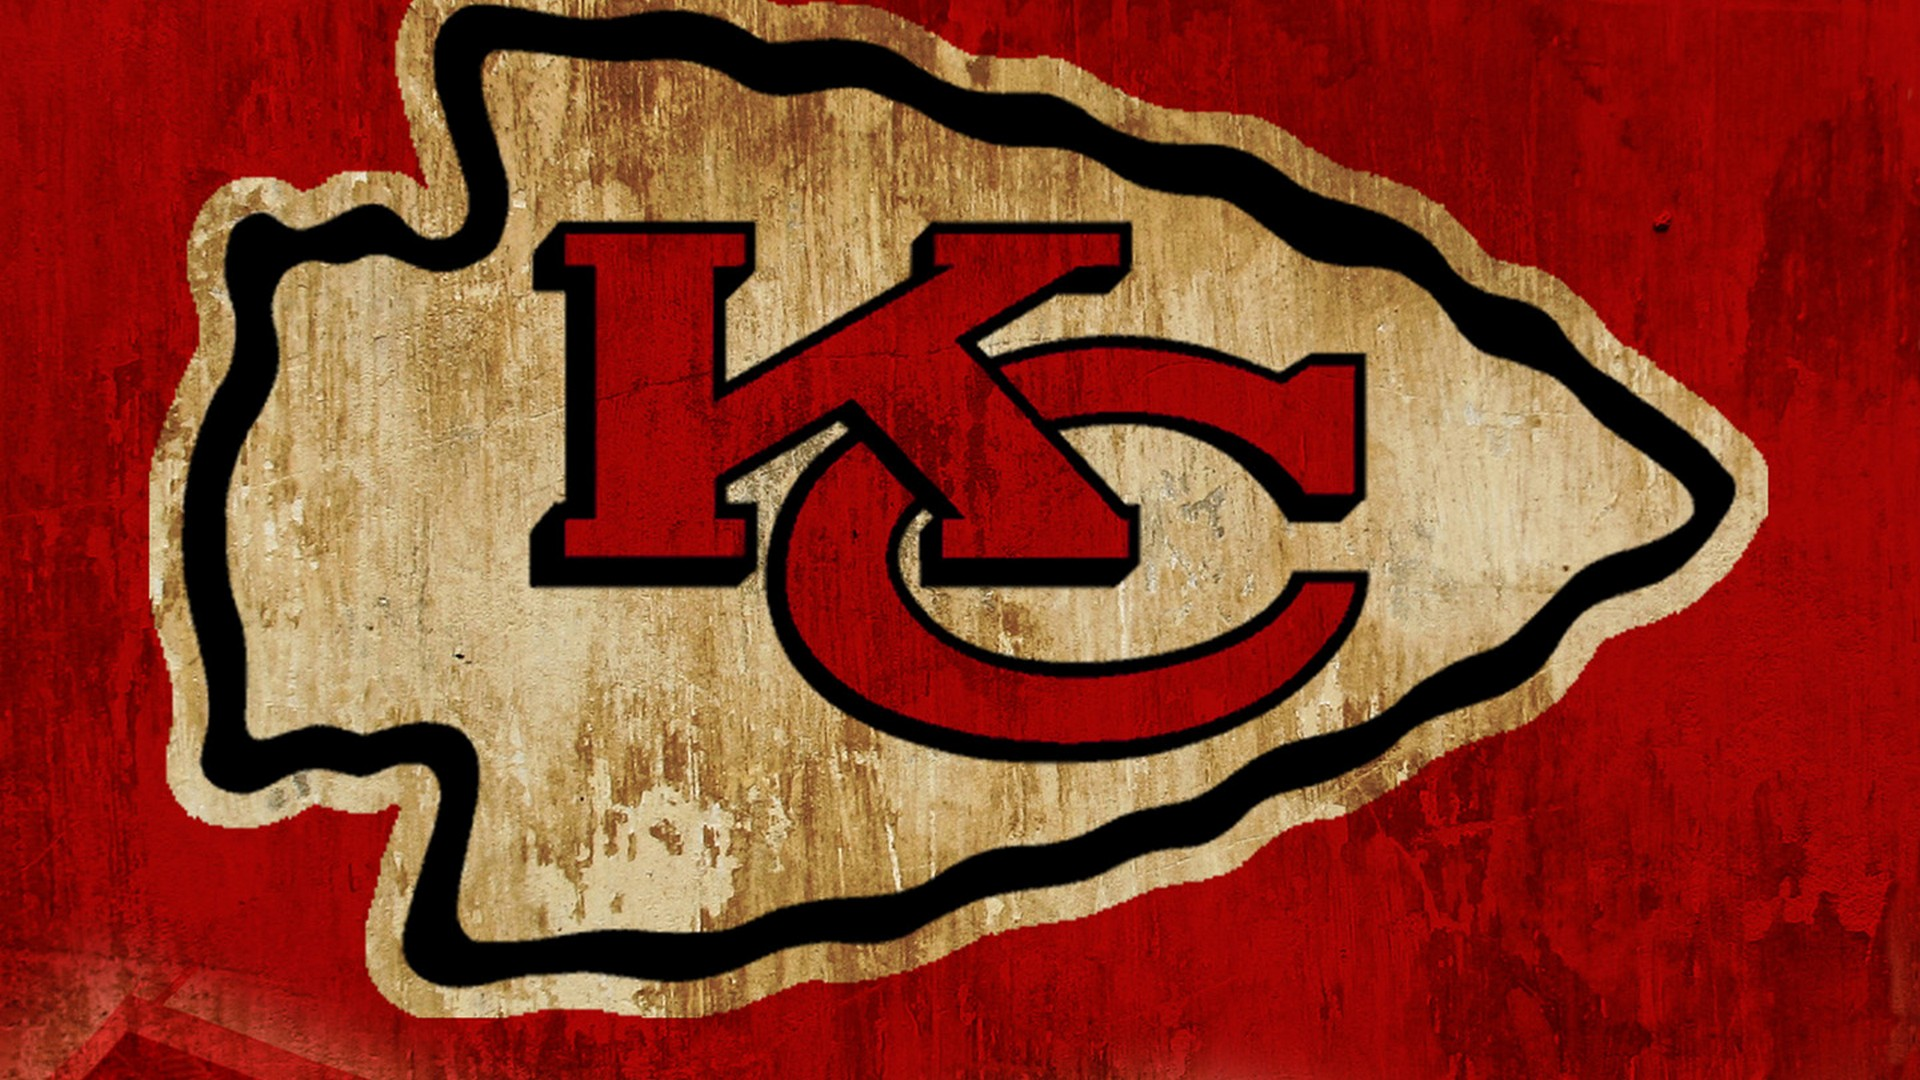 Wallpapers HD Kansas City Chiefs 2020 NFL Football Wallpapers 1920x1080